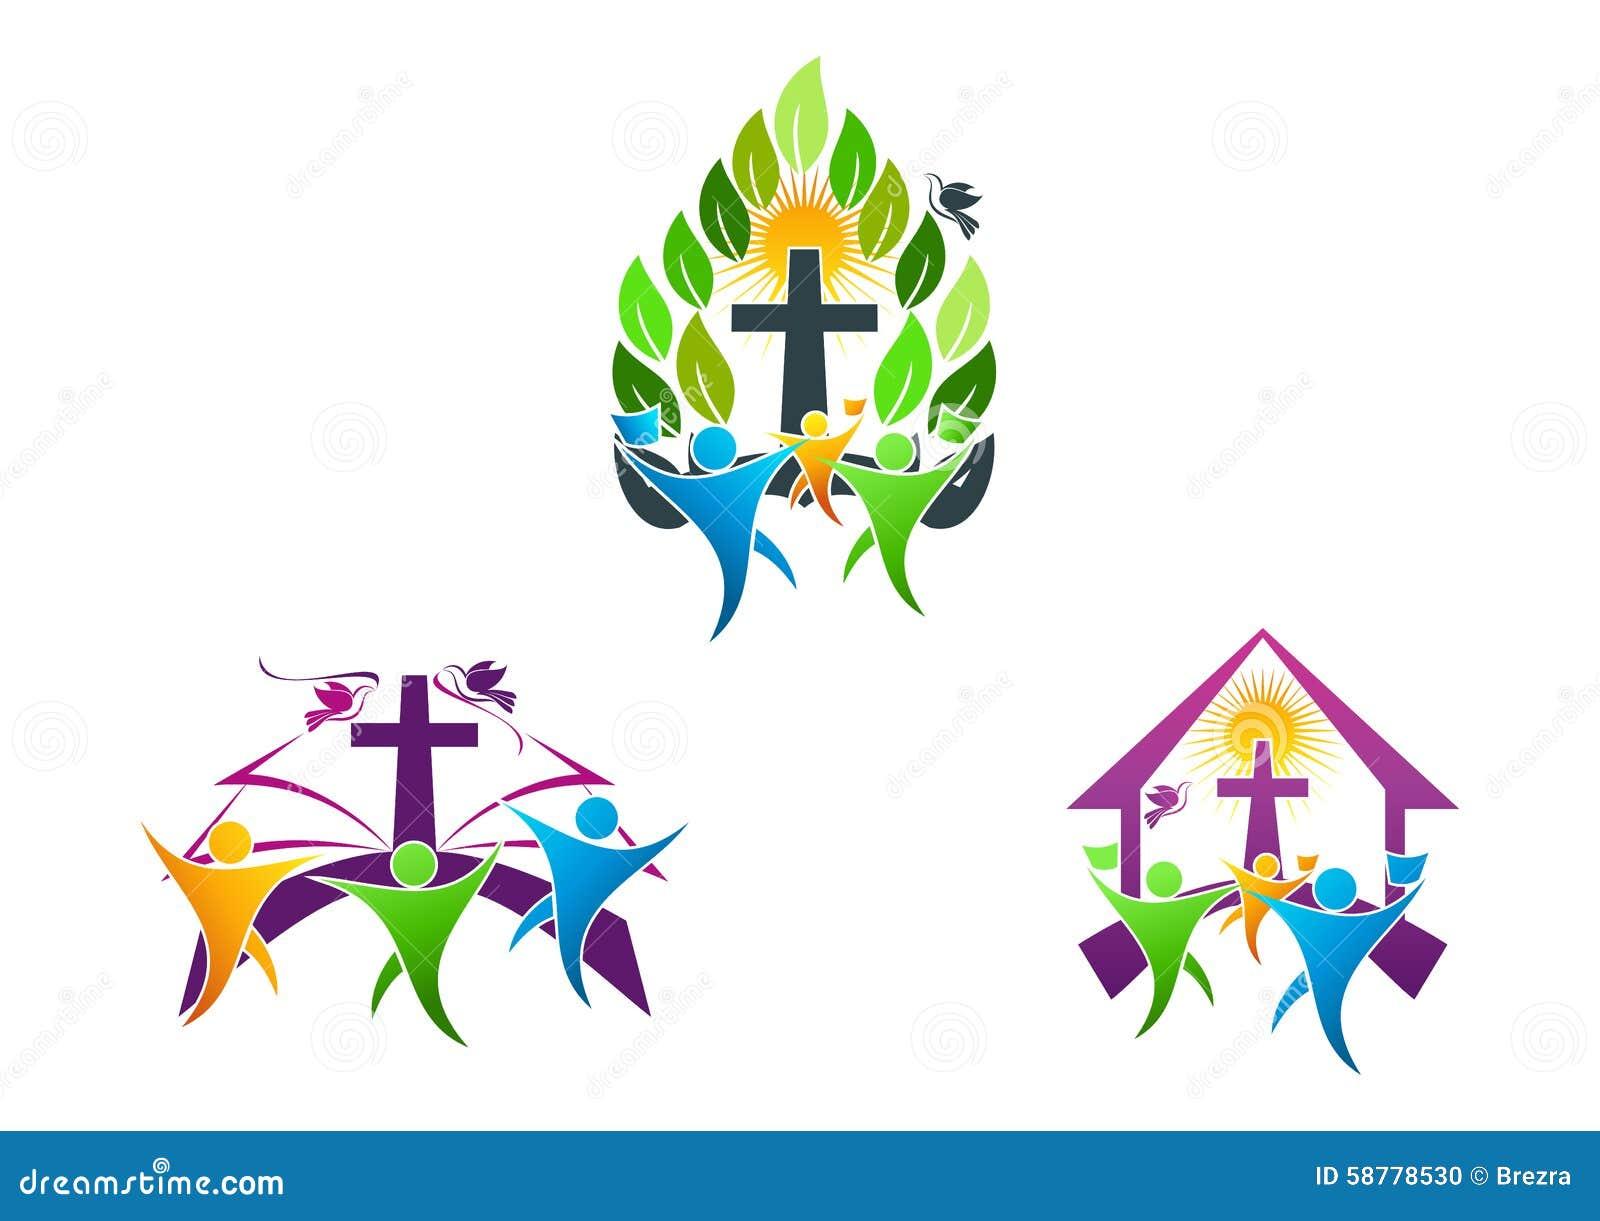 El Logotipo Cristiano De La Iglesia De La Gente La Biblia La